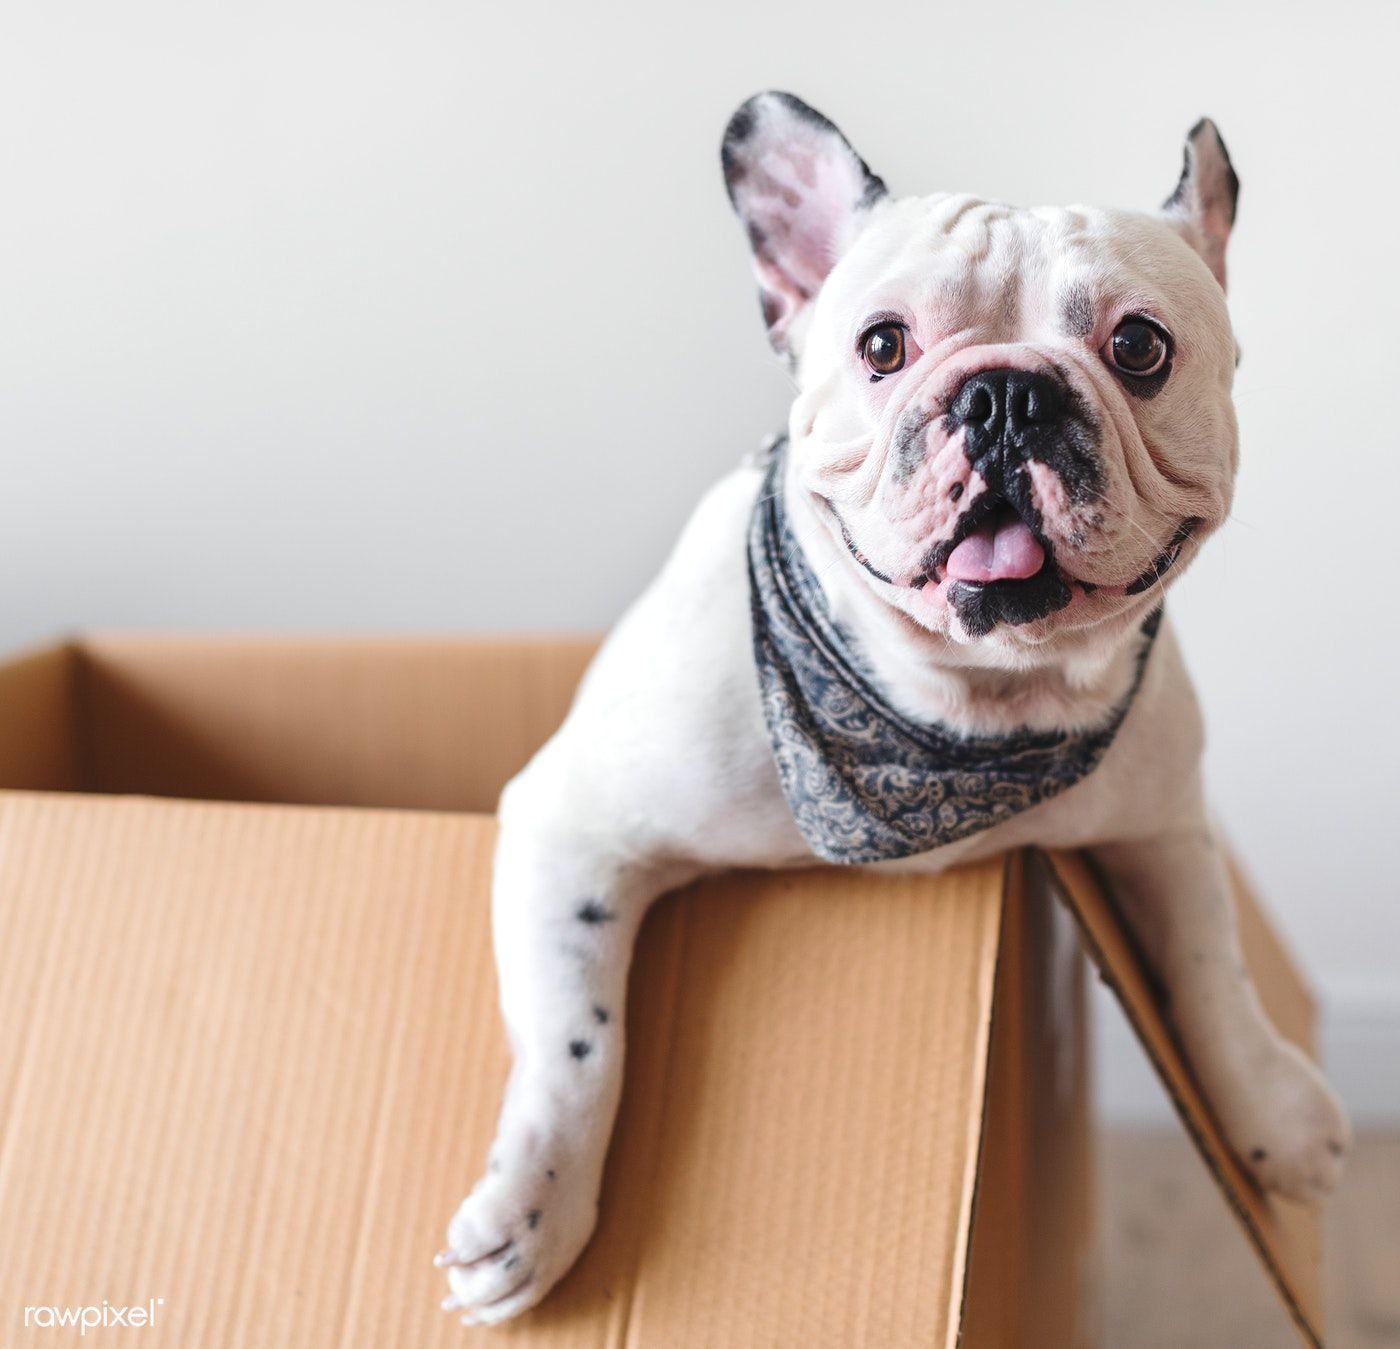 Download premium photo of Closeup of French bulldog 385679